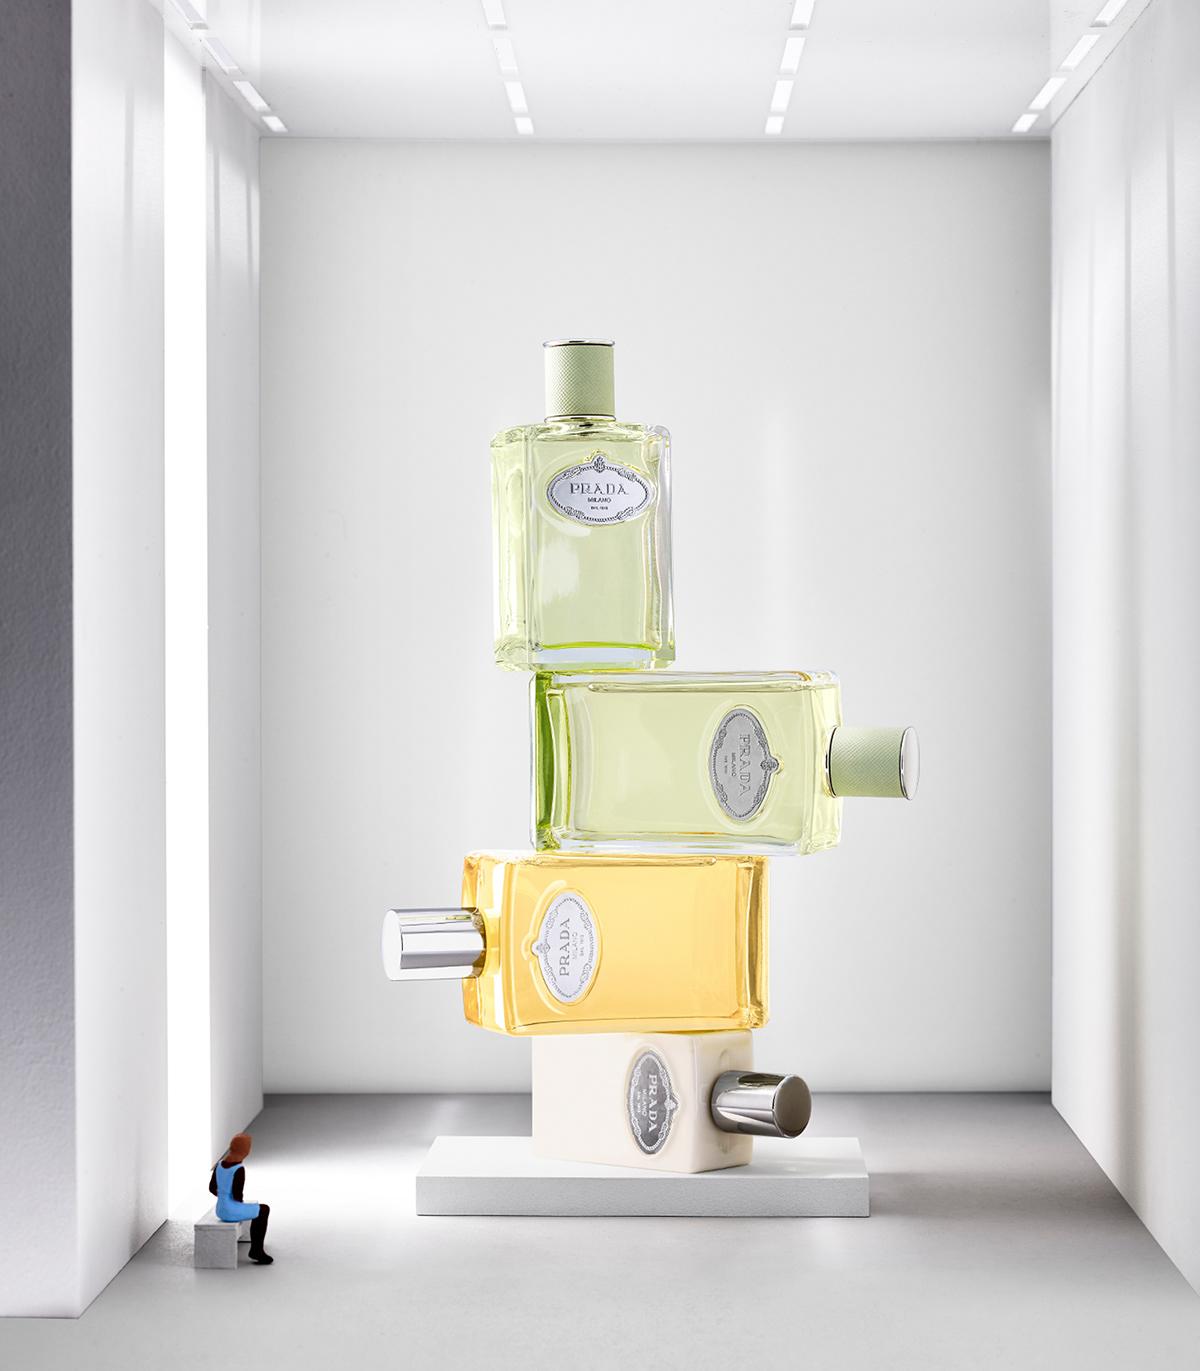 Image may contain: wall, indoor and clock